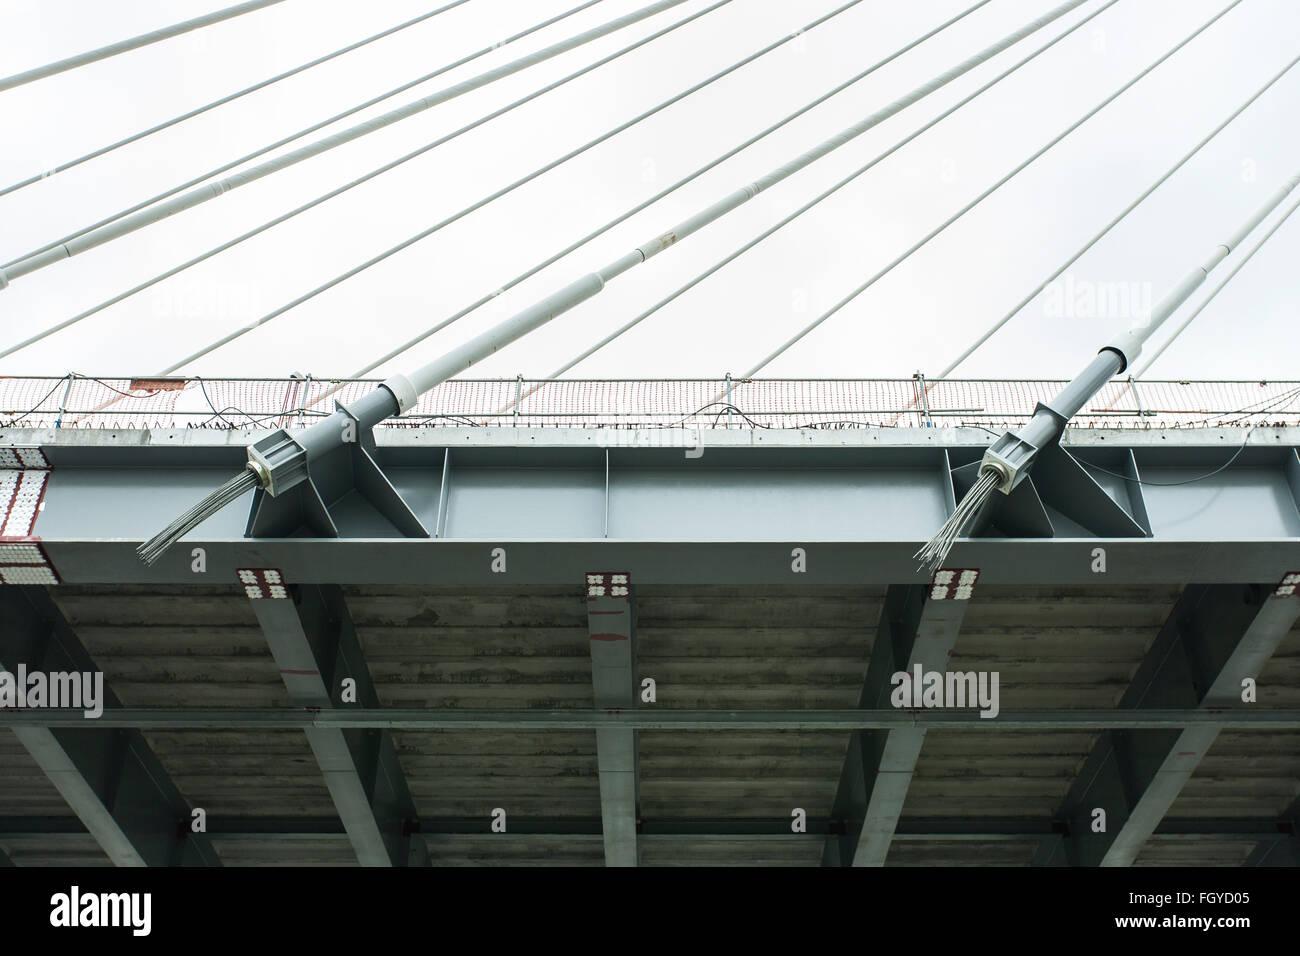 cable suspension bridge under construction river uk - Stock Image